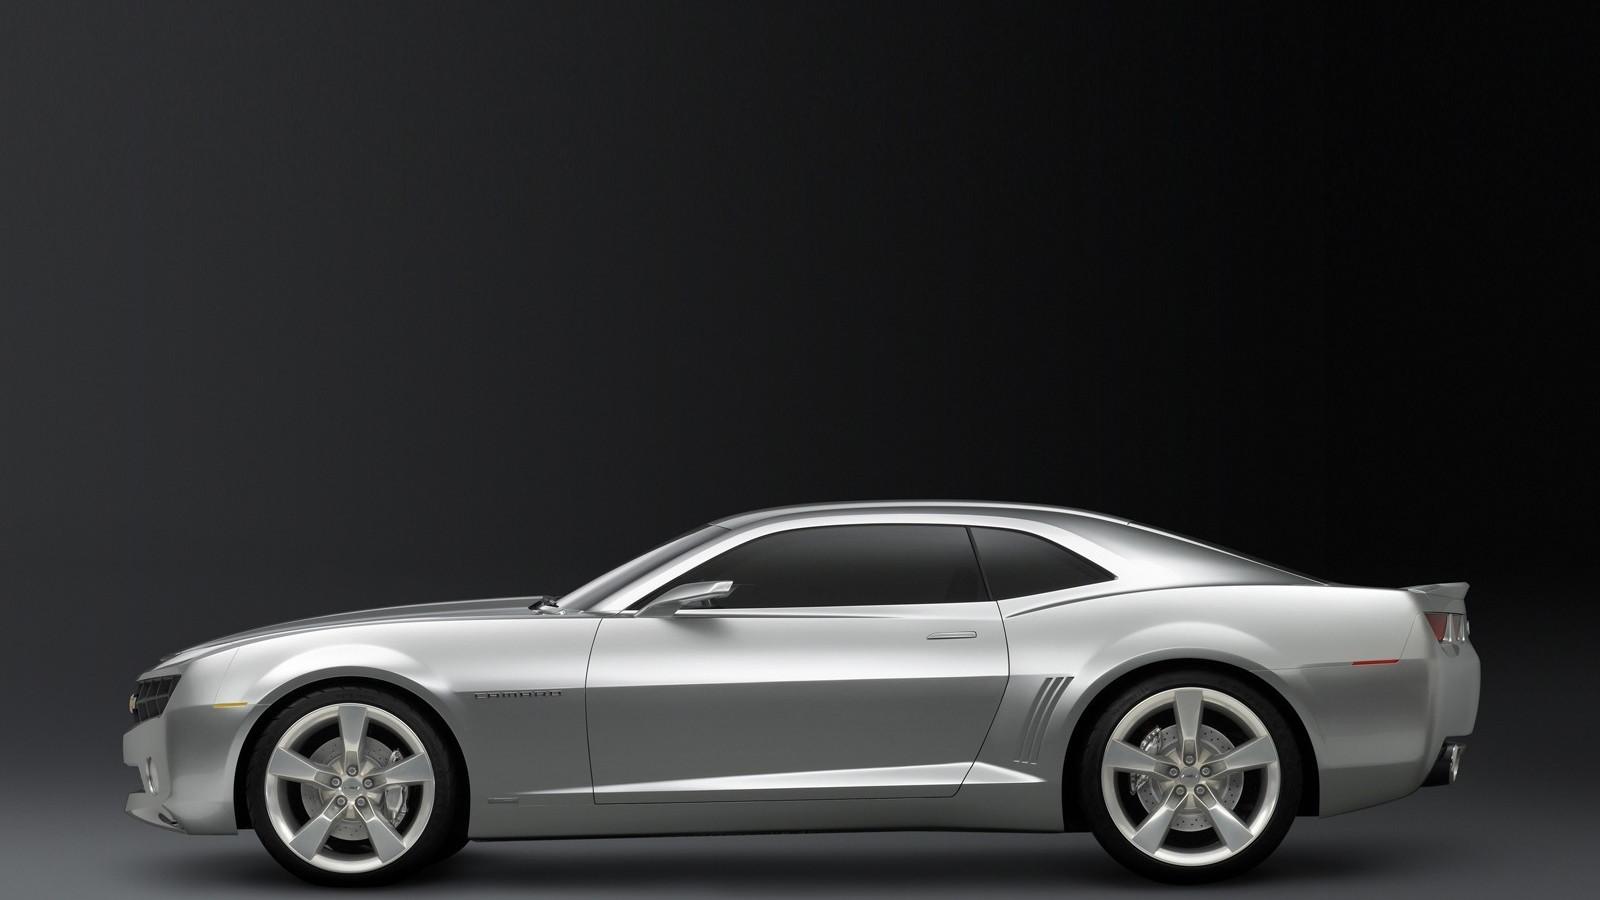 Chevrolet_Camaro_Concept_005.jpg